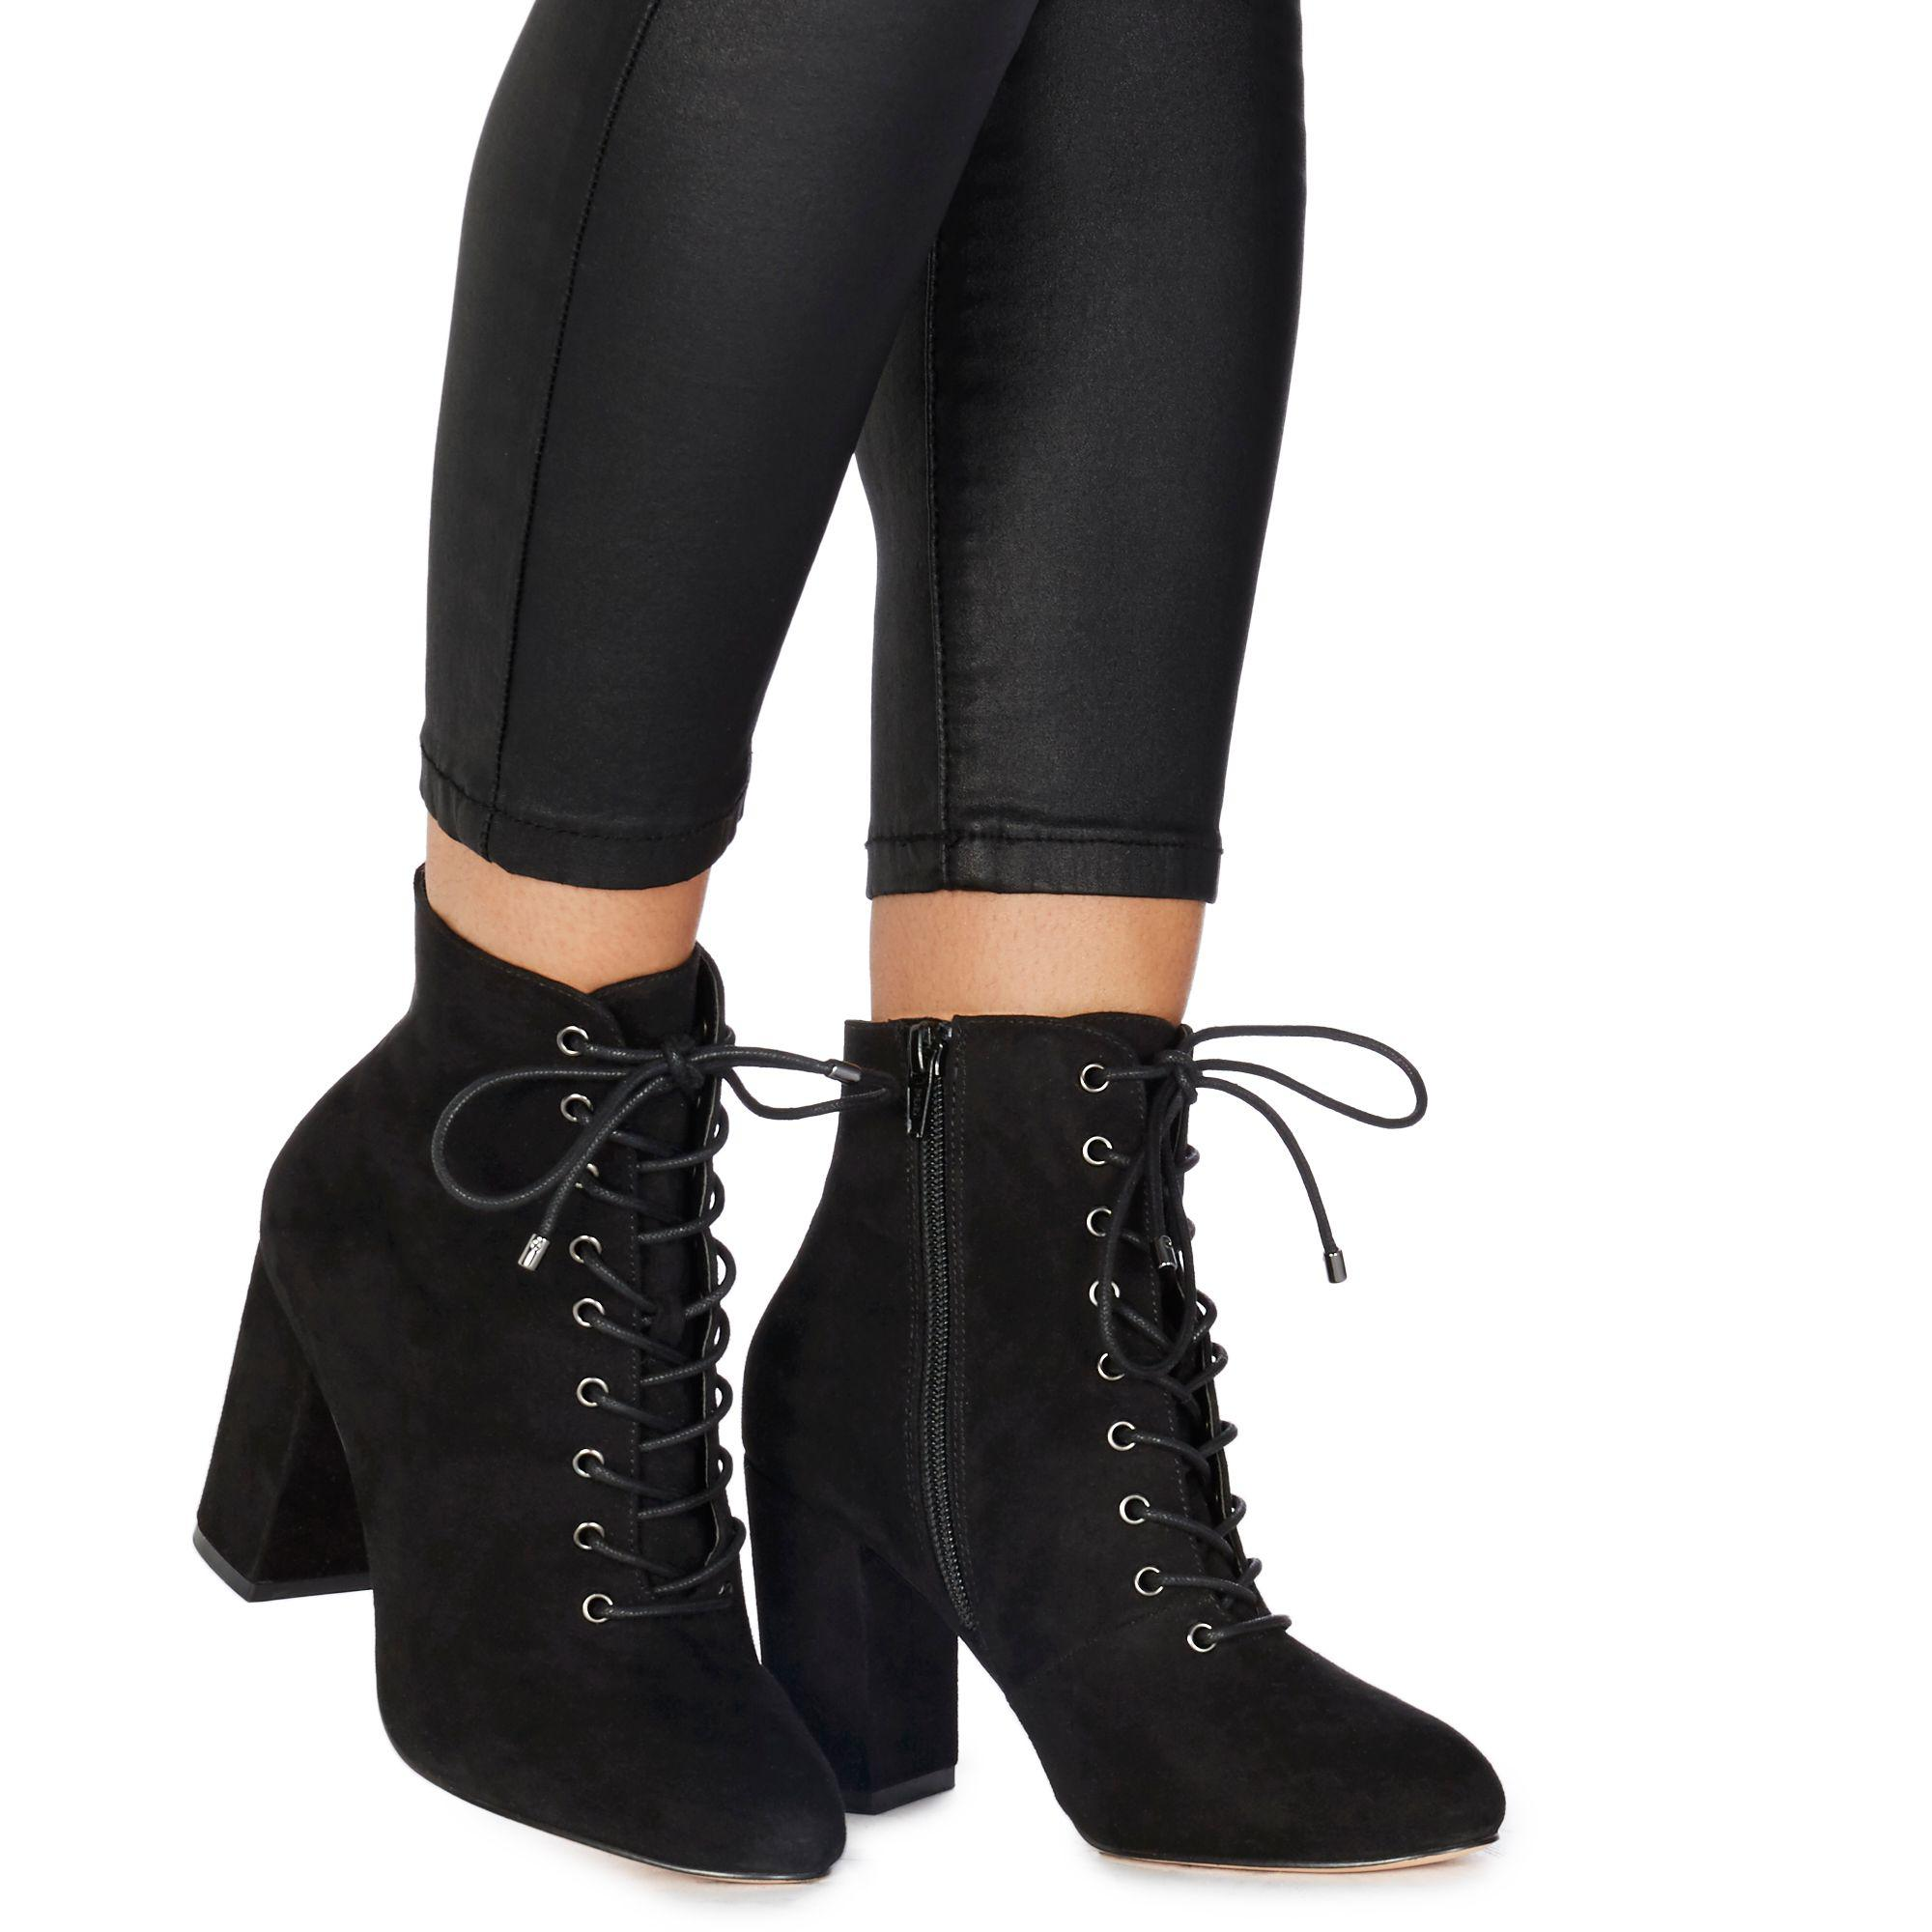 4ed7da1ac061 Faith Black Suedette  barb  High Block Heel Ankle Boots in Black - Lyst